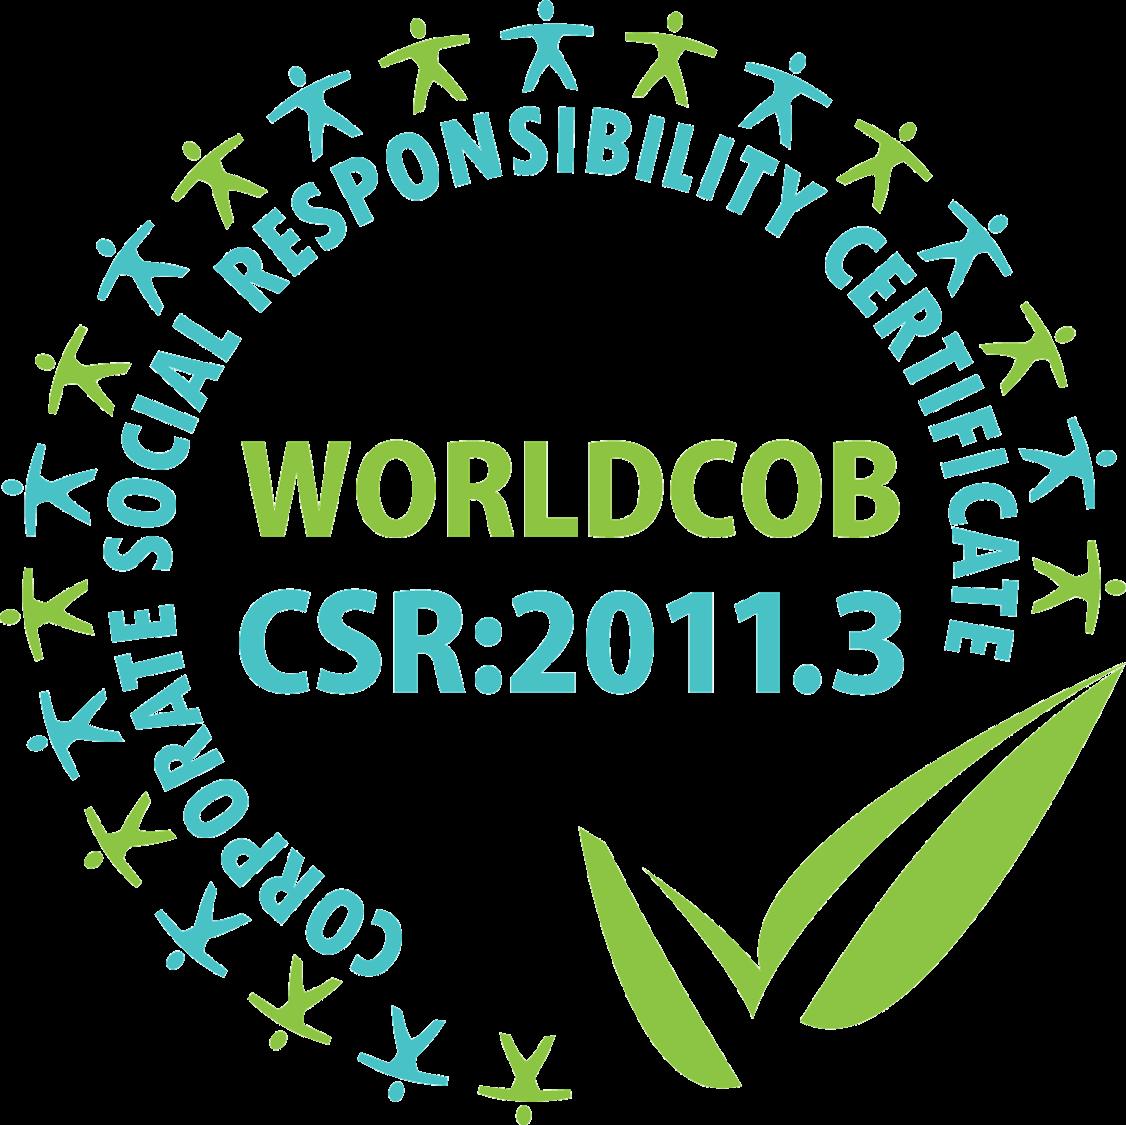 WORLDCOBCSR:2011.3